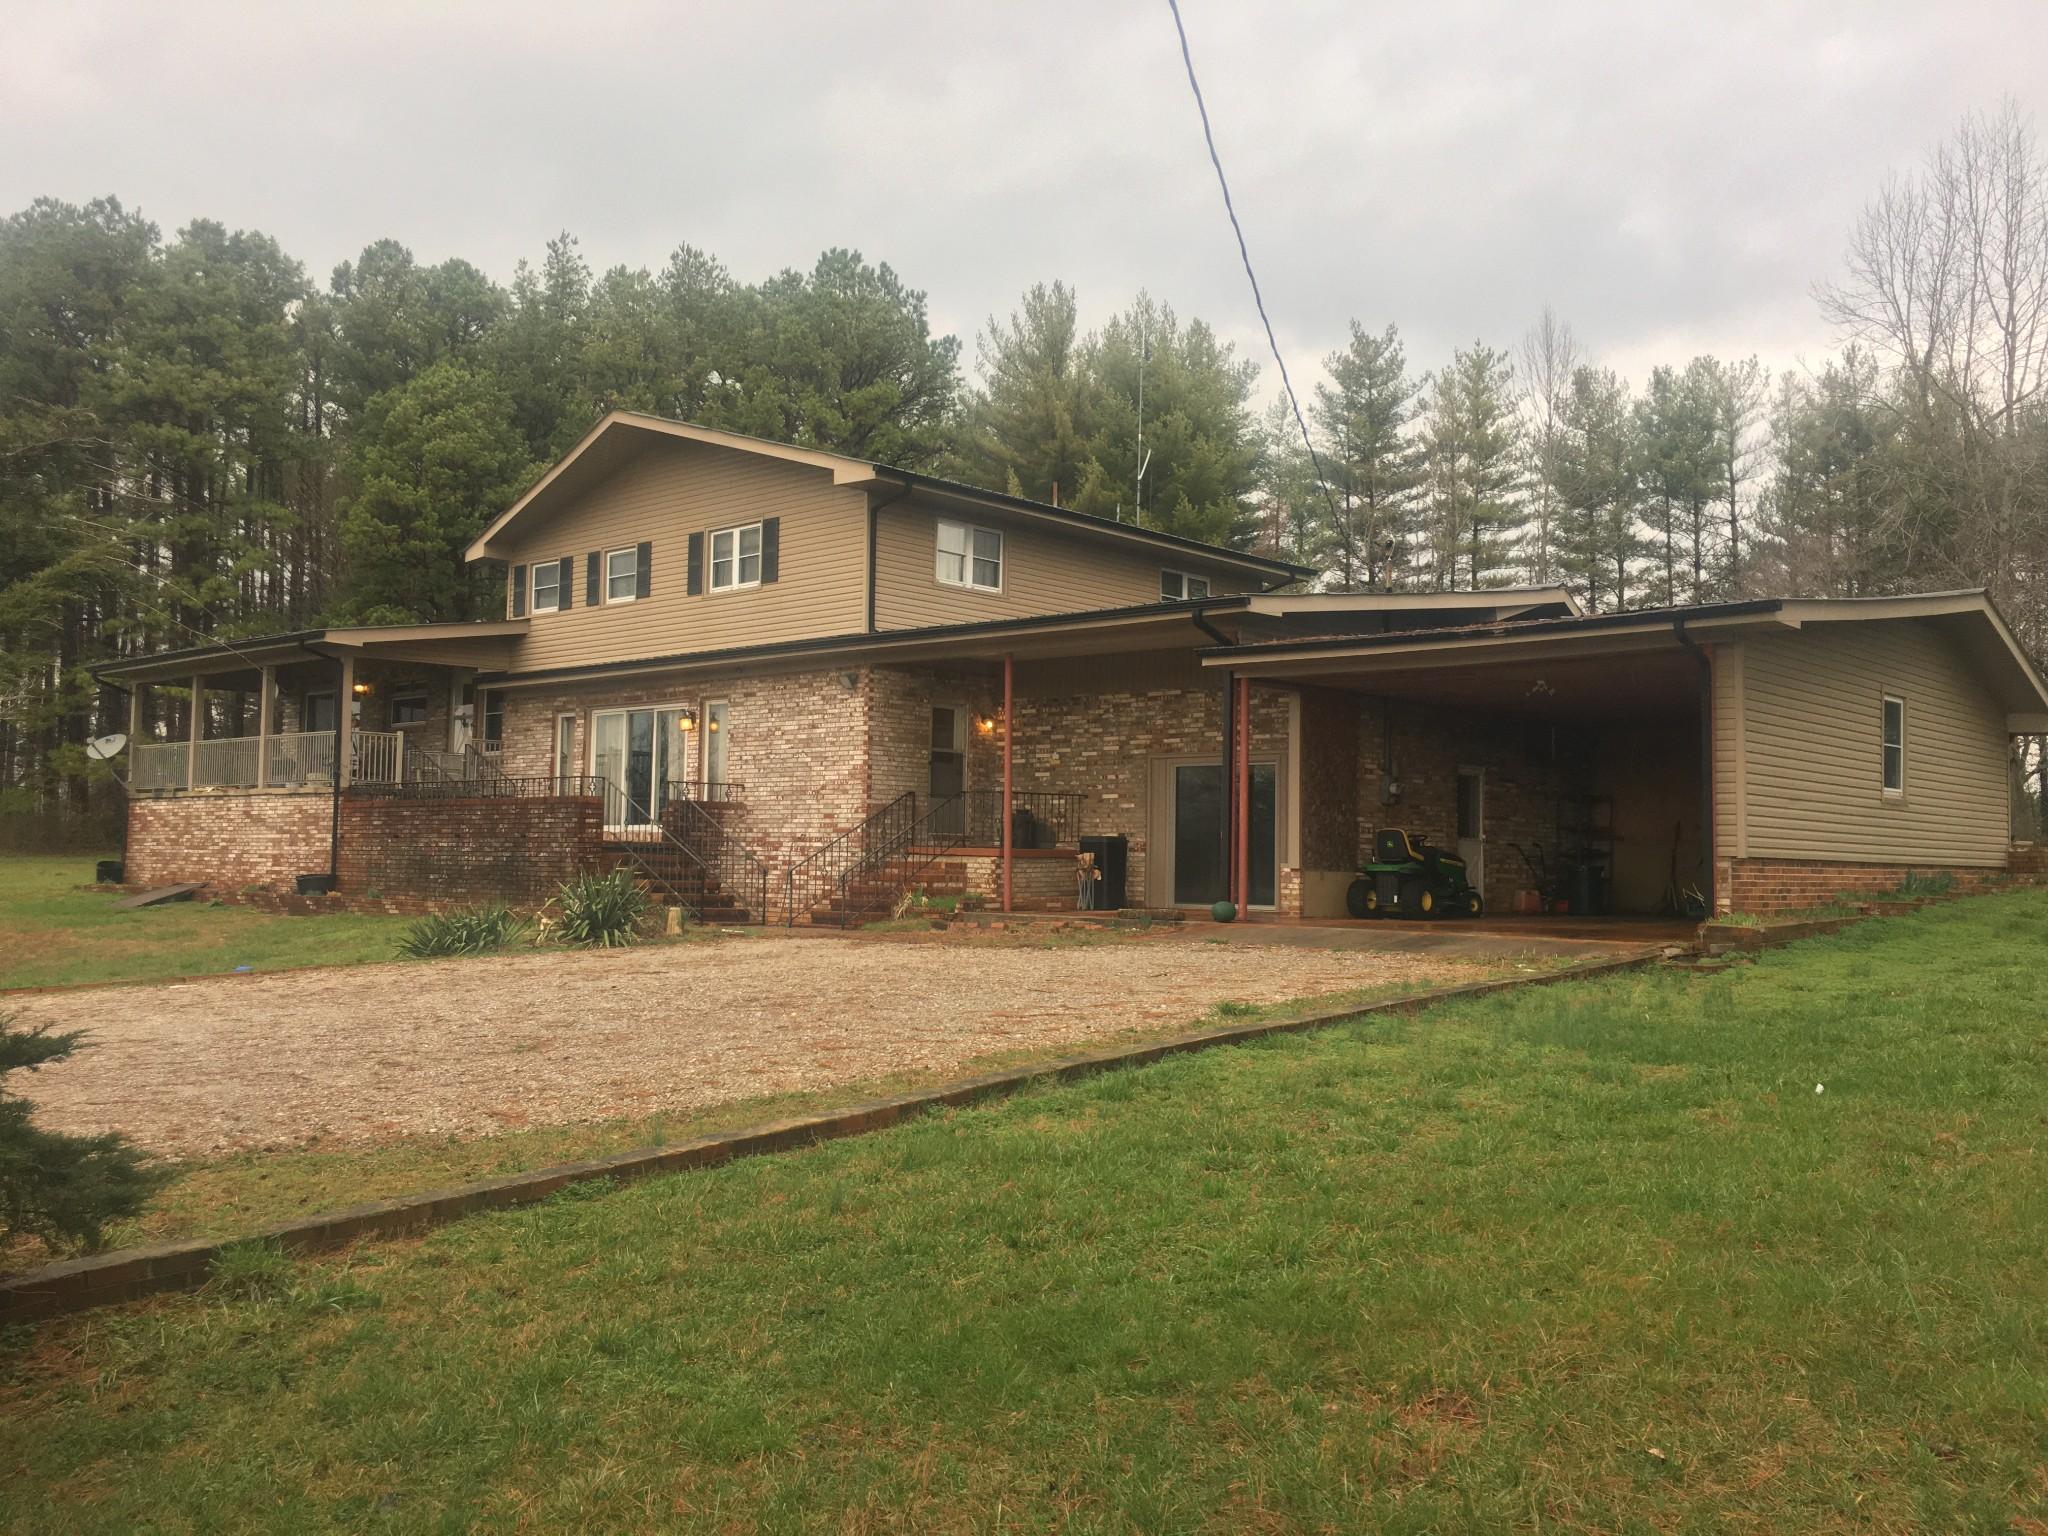 2406 Blue Spring Rd, Decherd, TN 37324 - Decherd, TN real estate listing